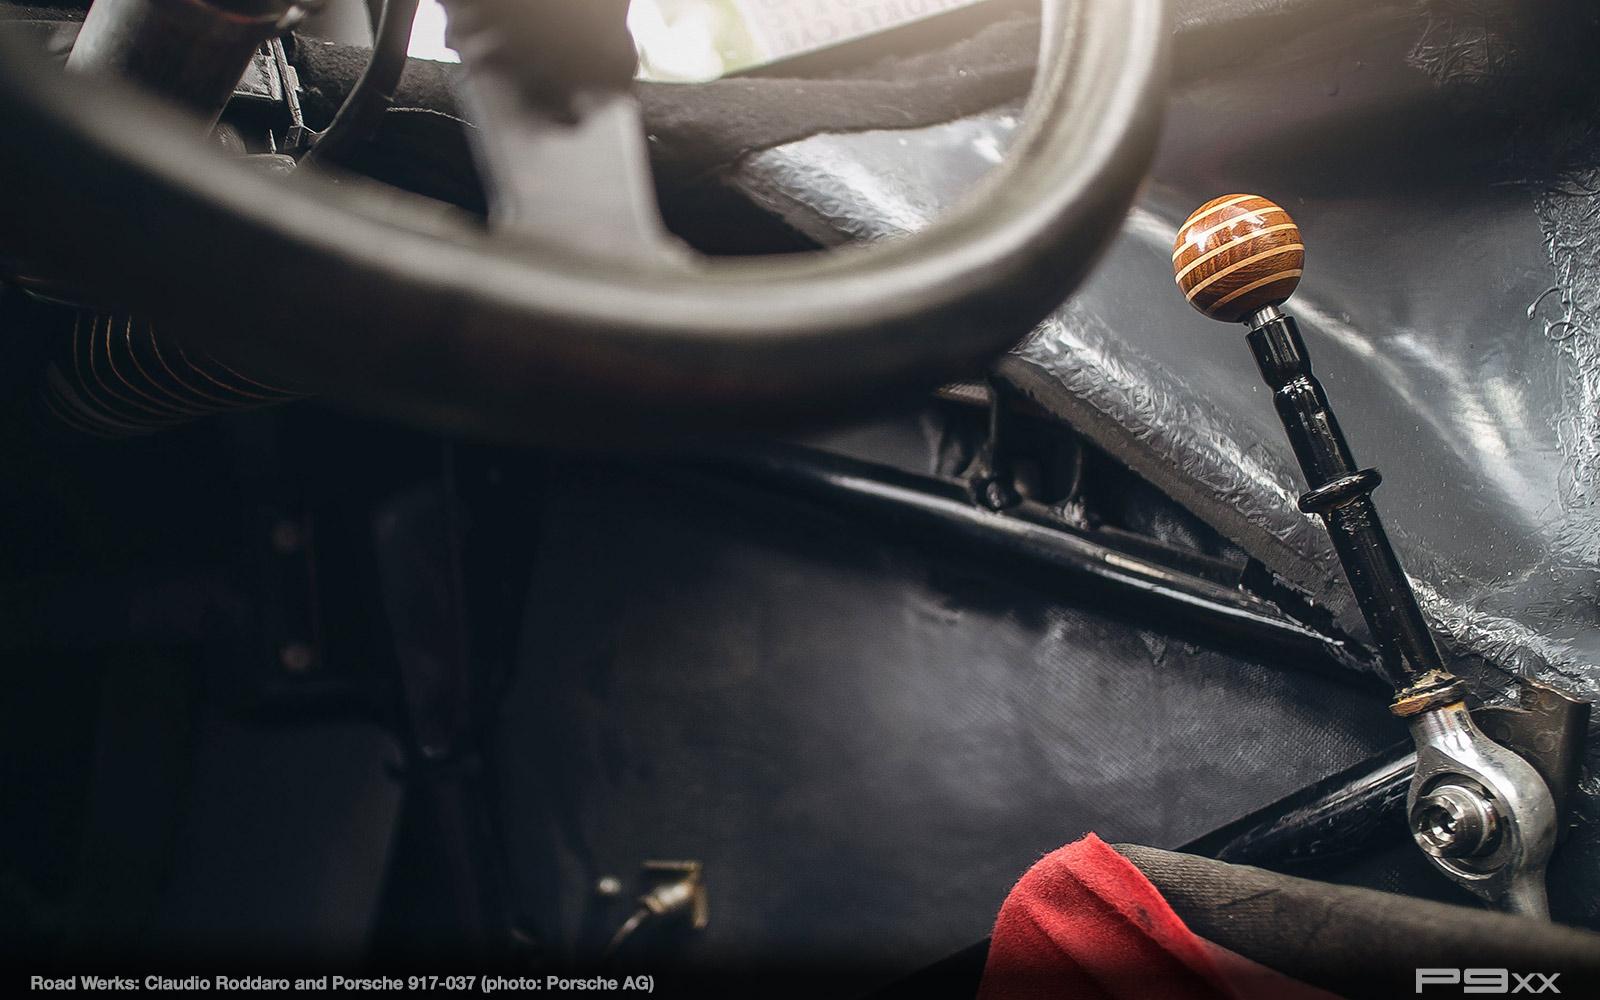 Porsche-917-037-Martini-Racing-Monaco-2018-298